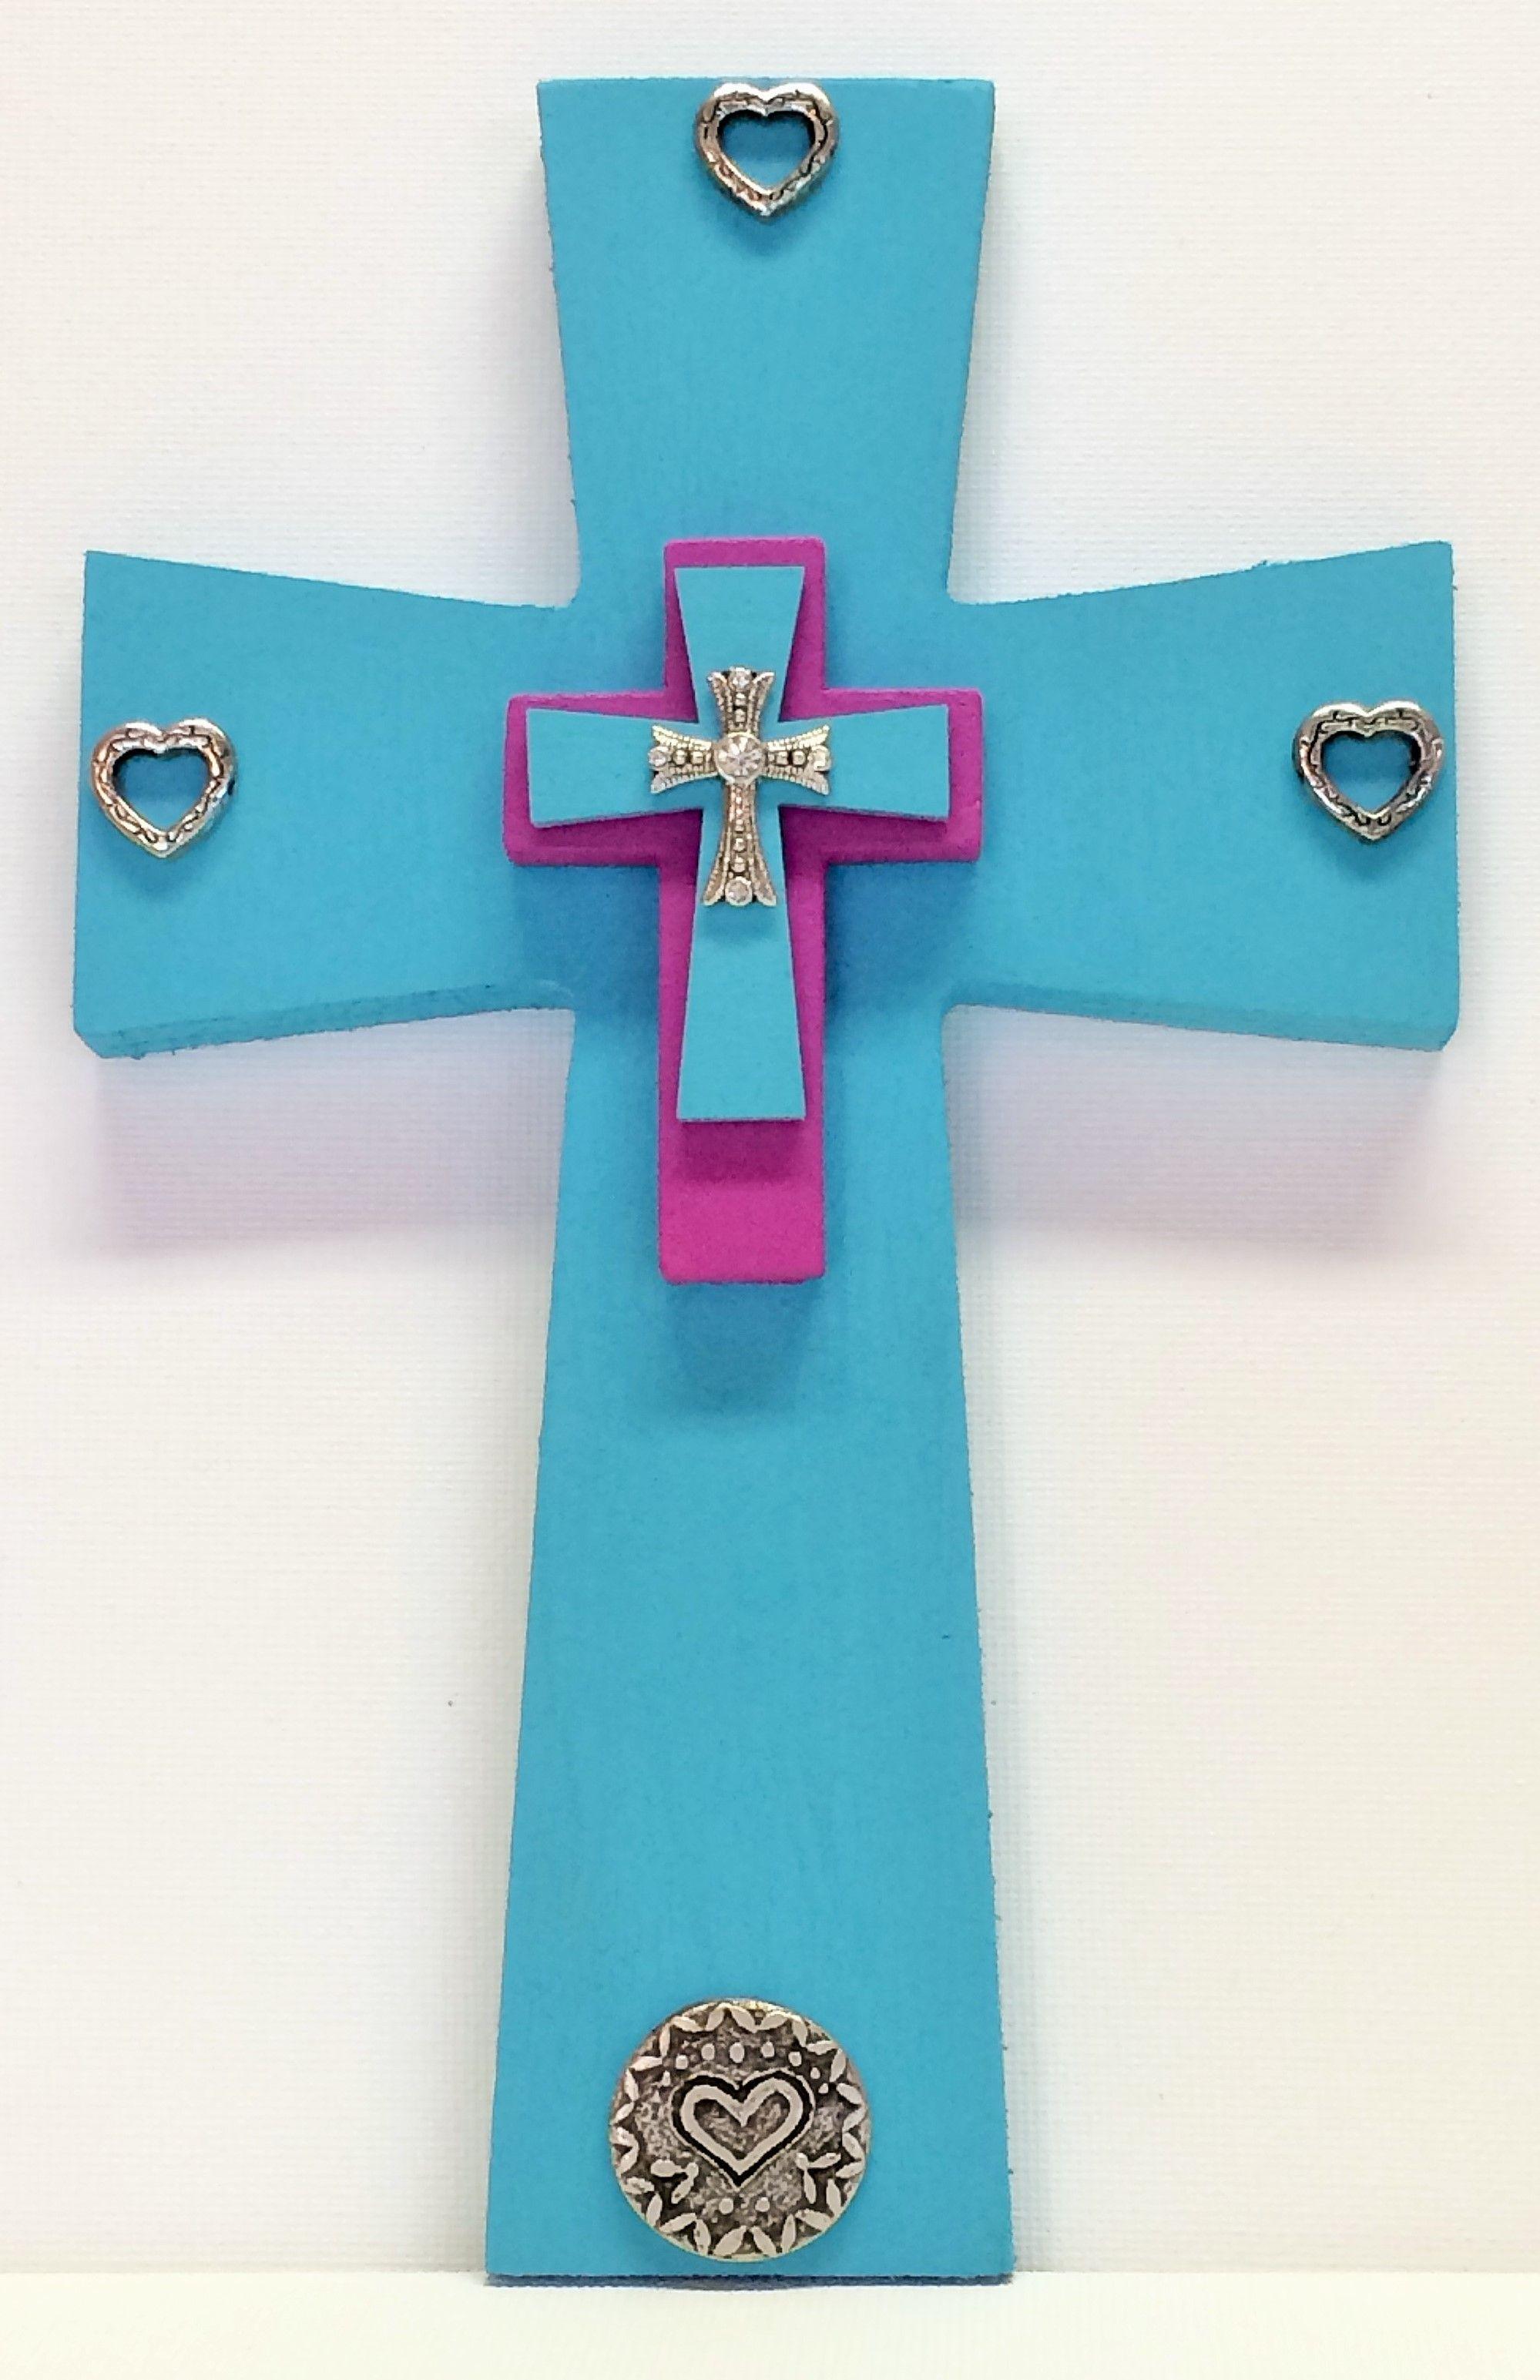 Faithful Heart 8x5wood Cross Painted Robins Egg Blue With